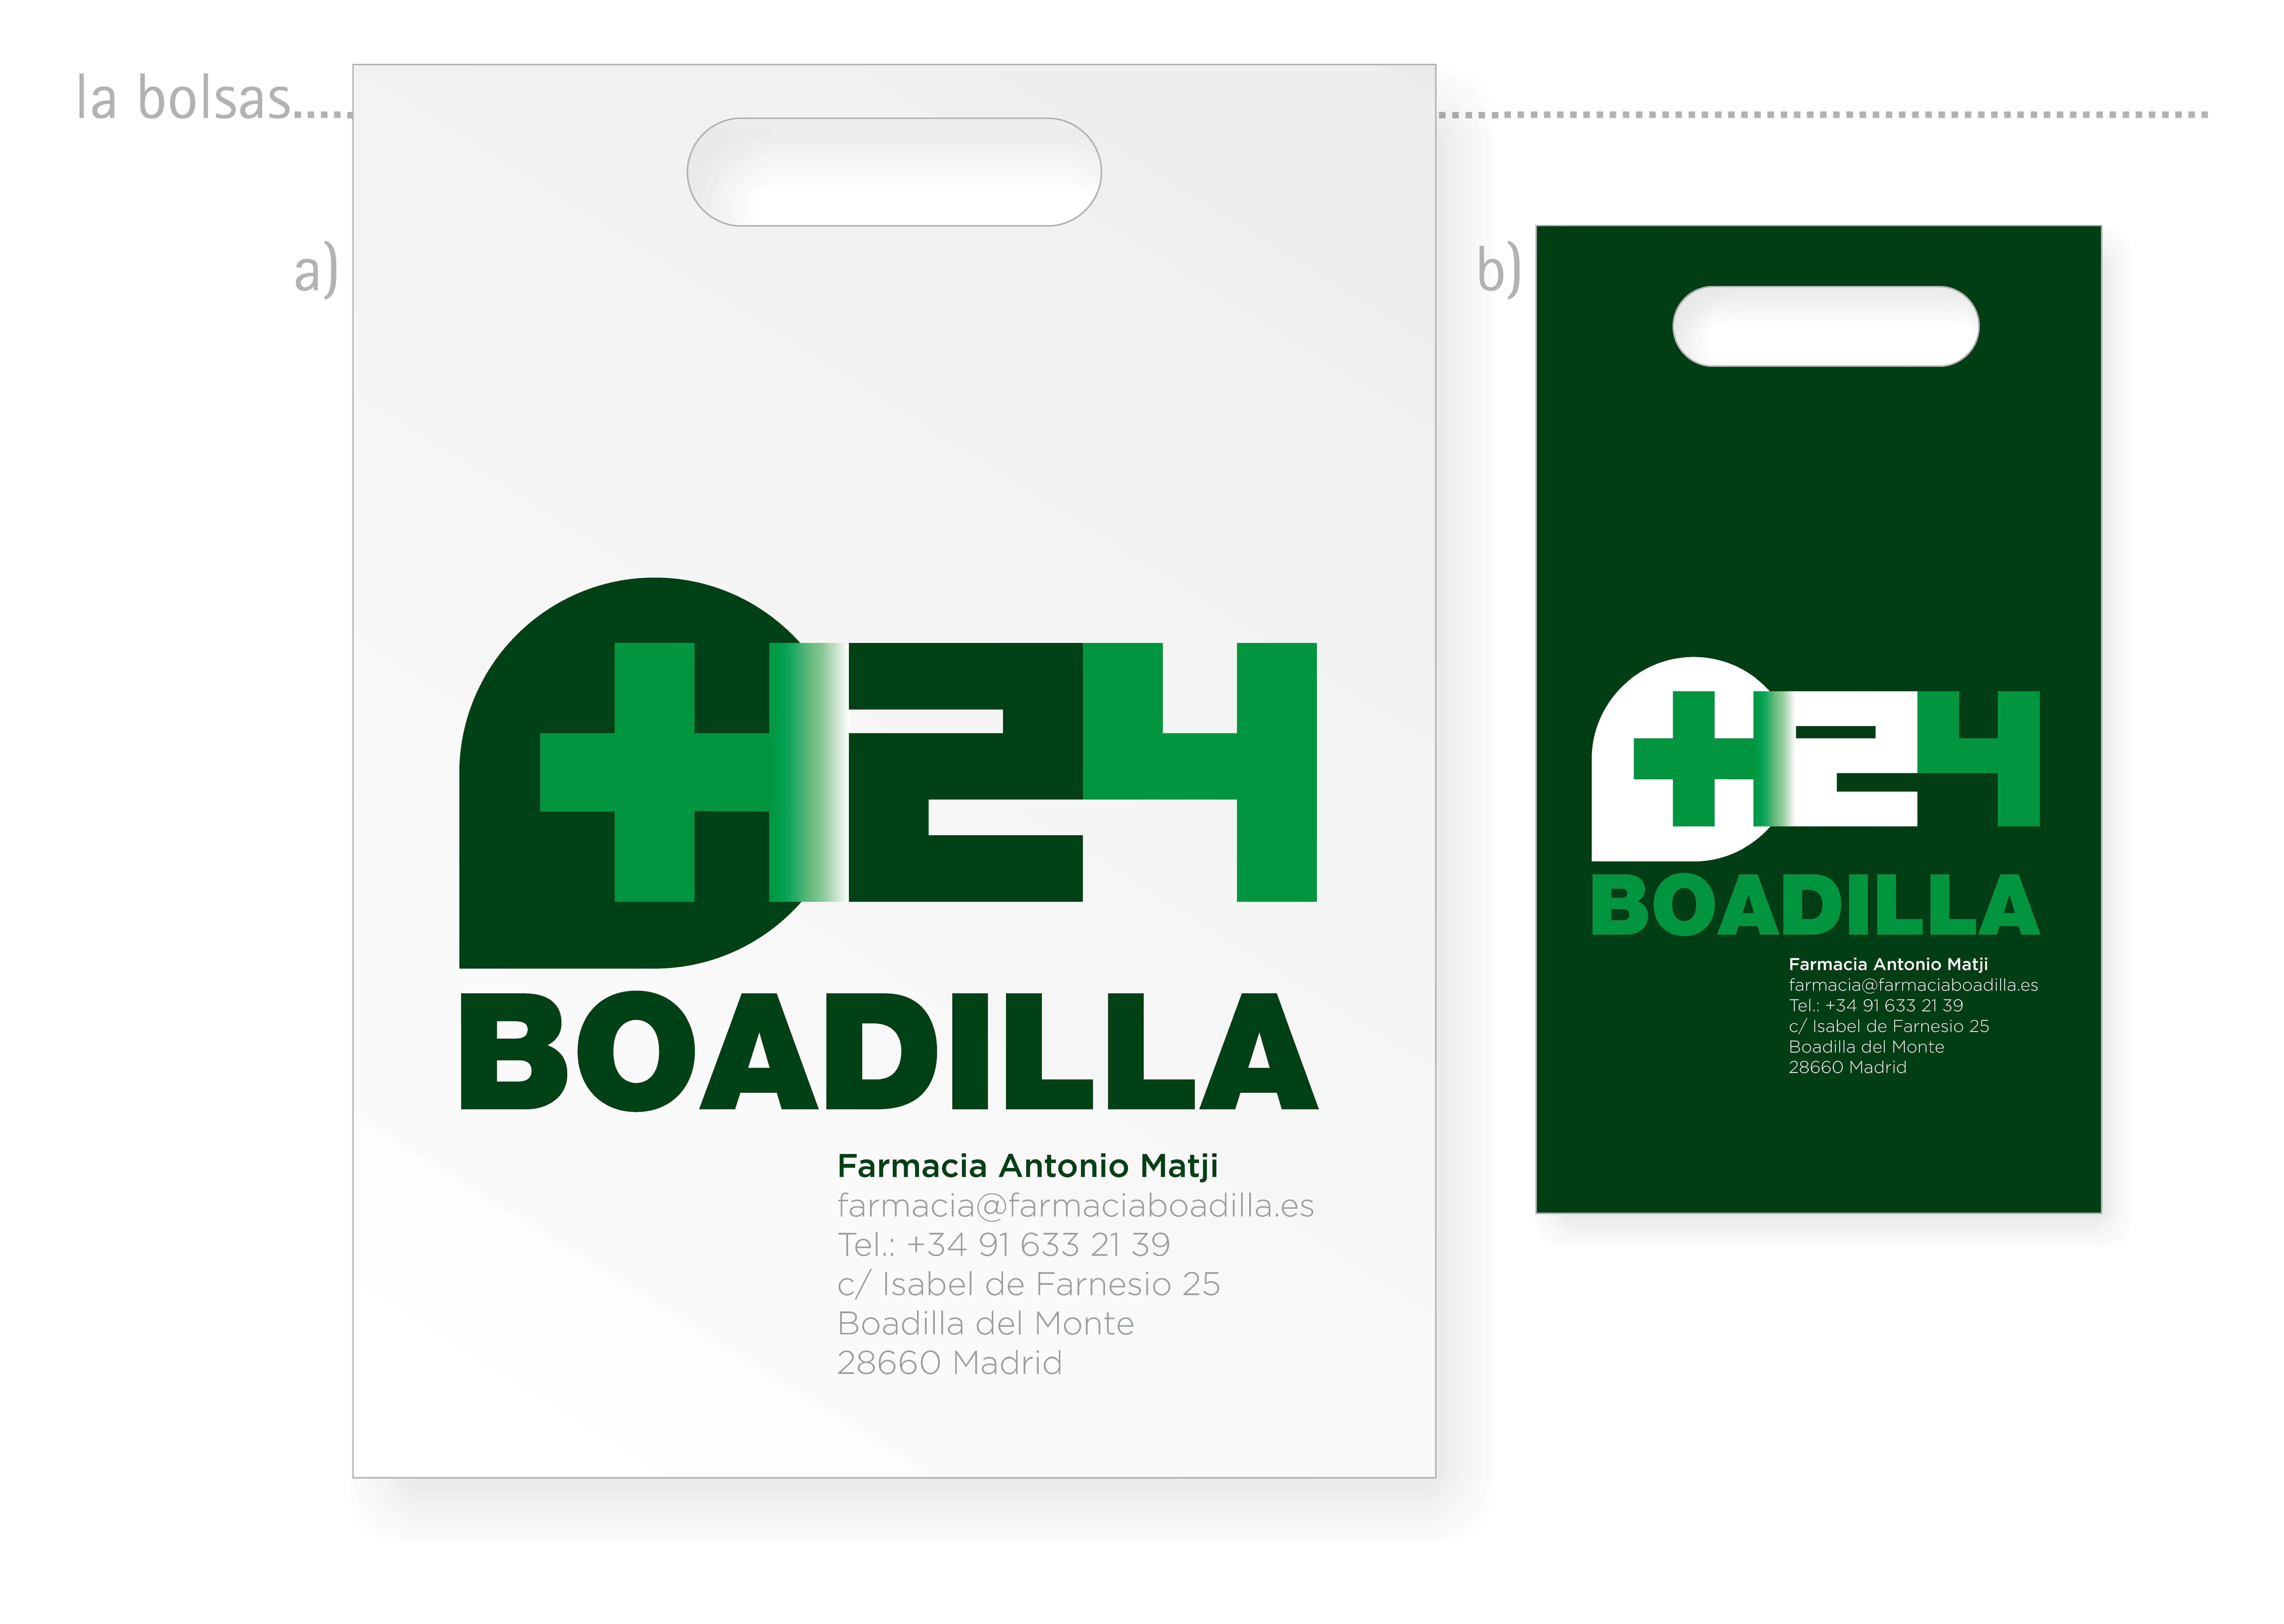 IC Logo y papeleria BOADILLA H24 (3).jpg